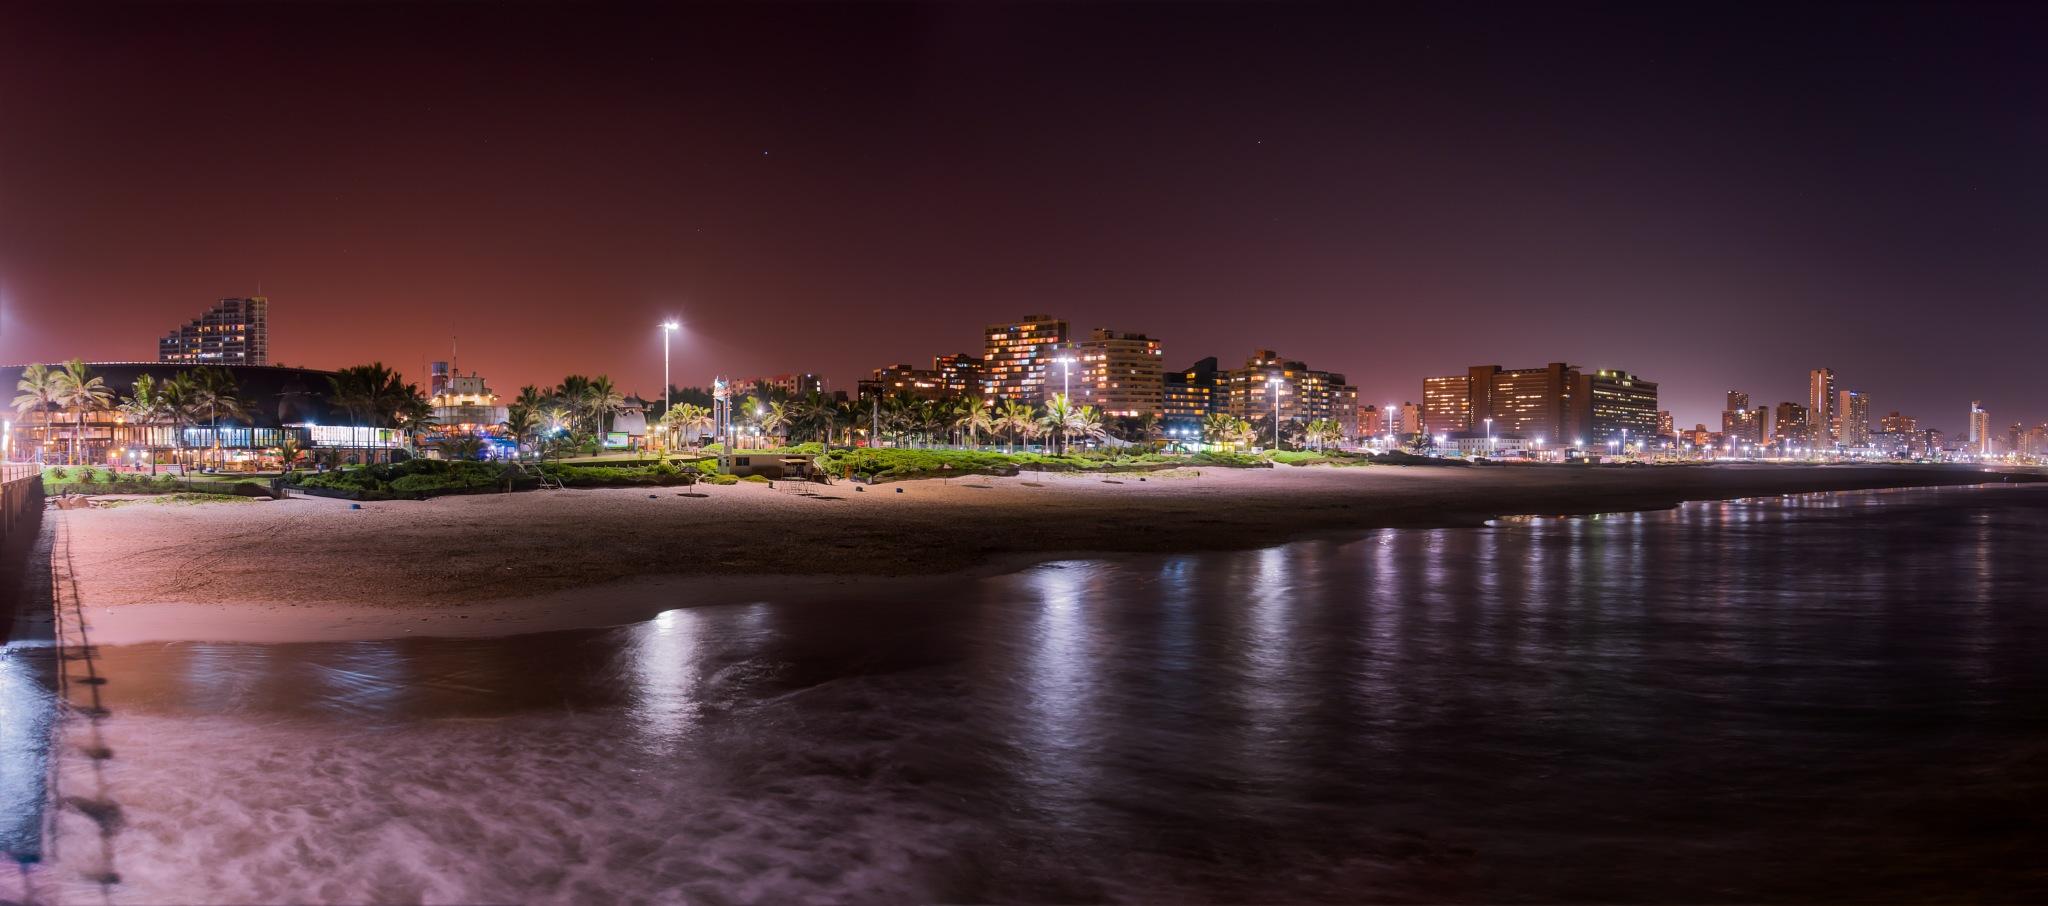 Durban City, South Africa by kartaba